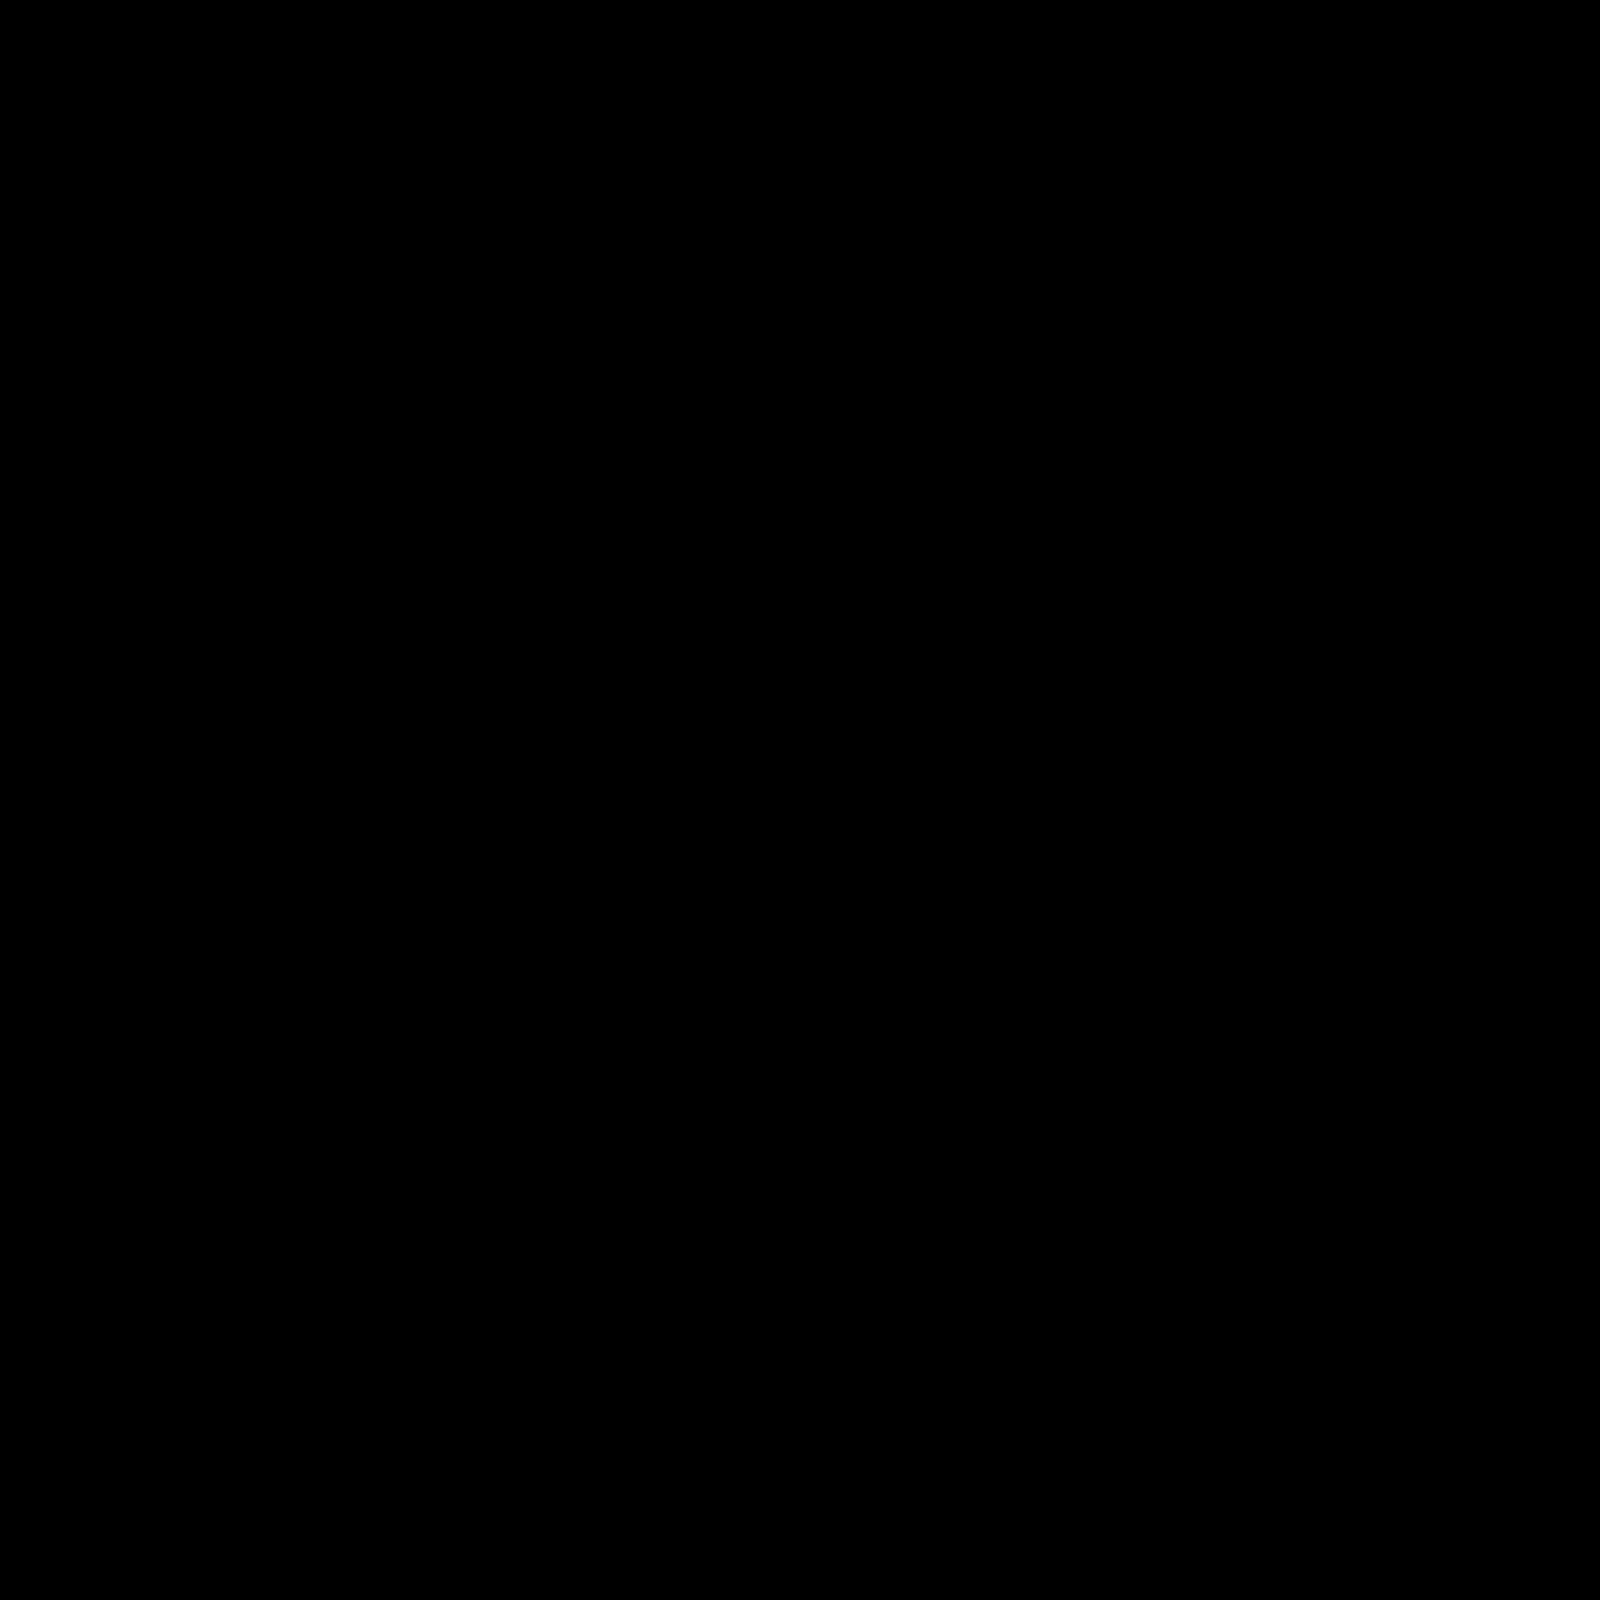 Eye Filled icon